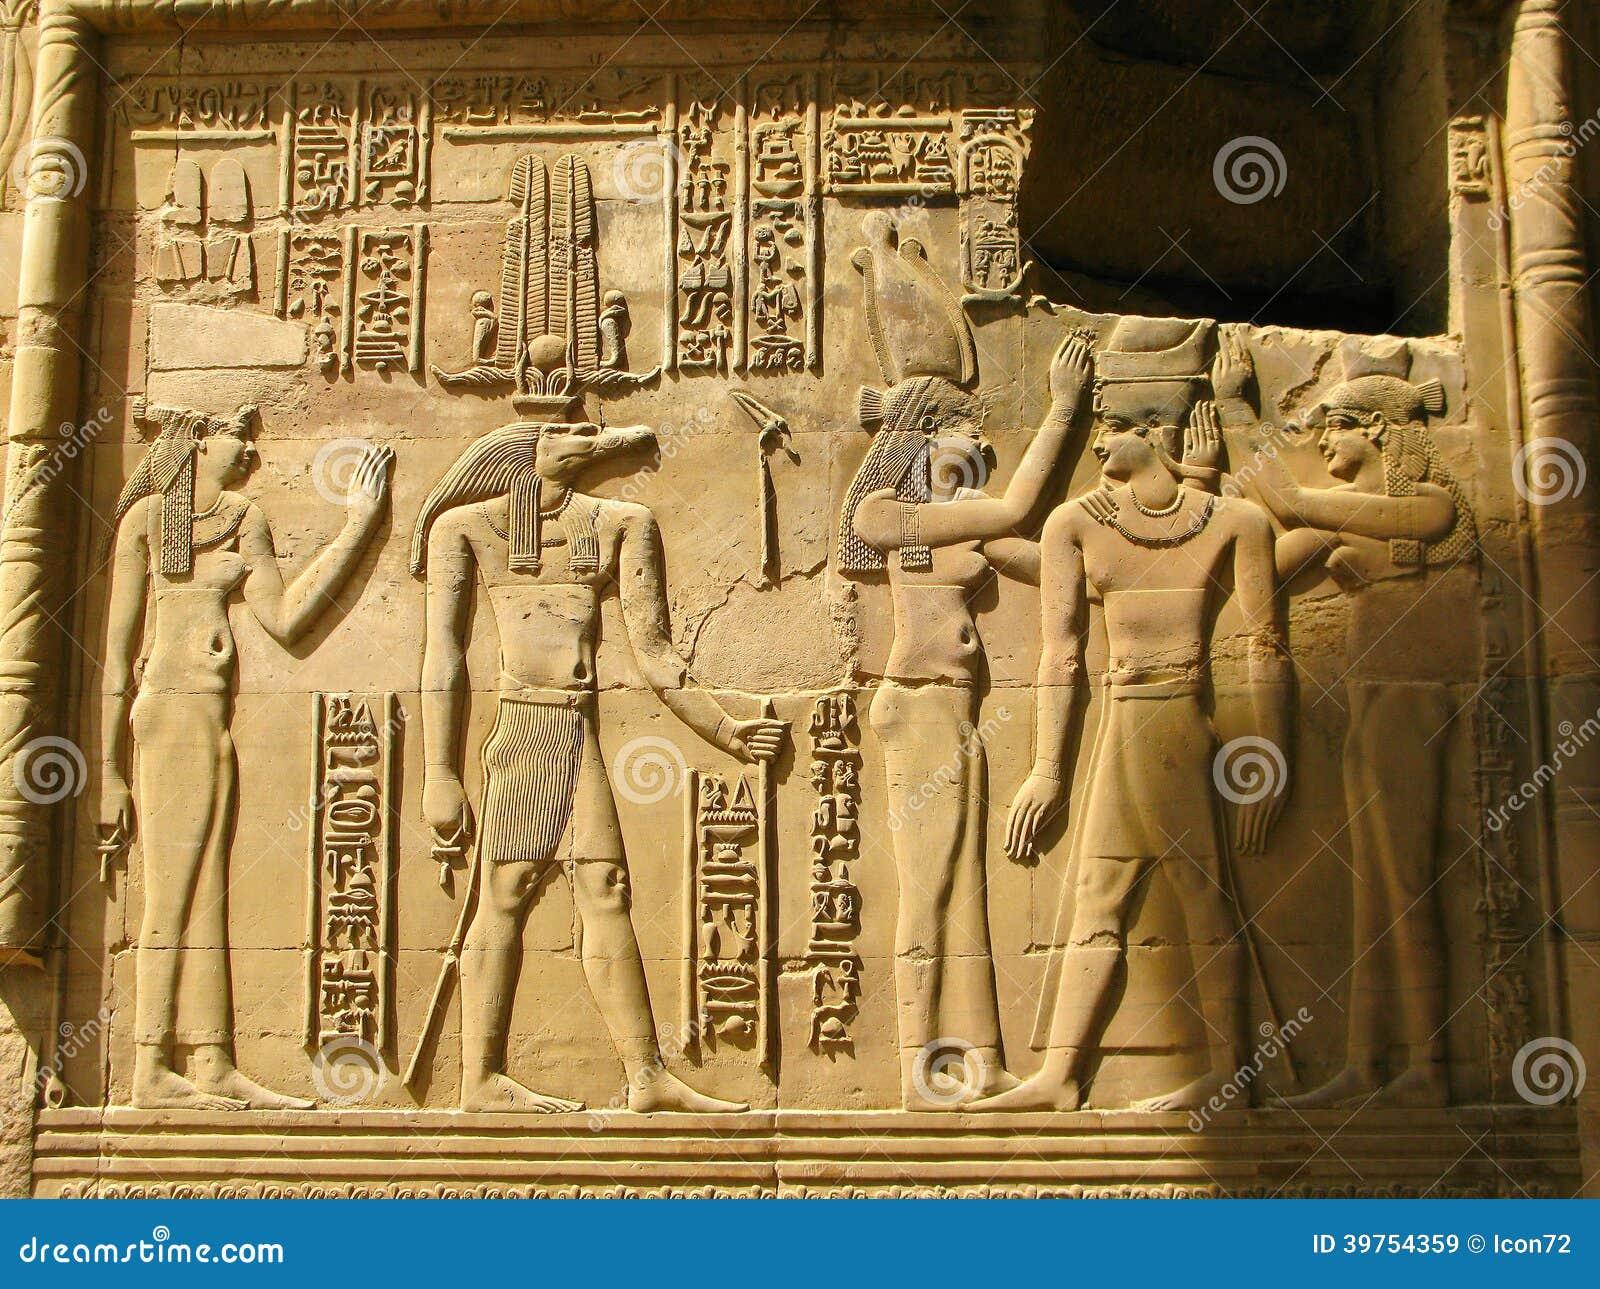 sobek ndash hieroglyphic inscriptions - photo #19